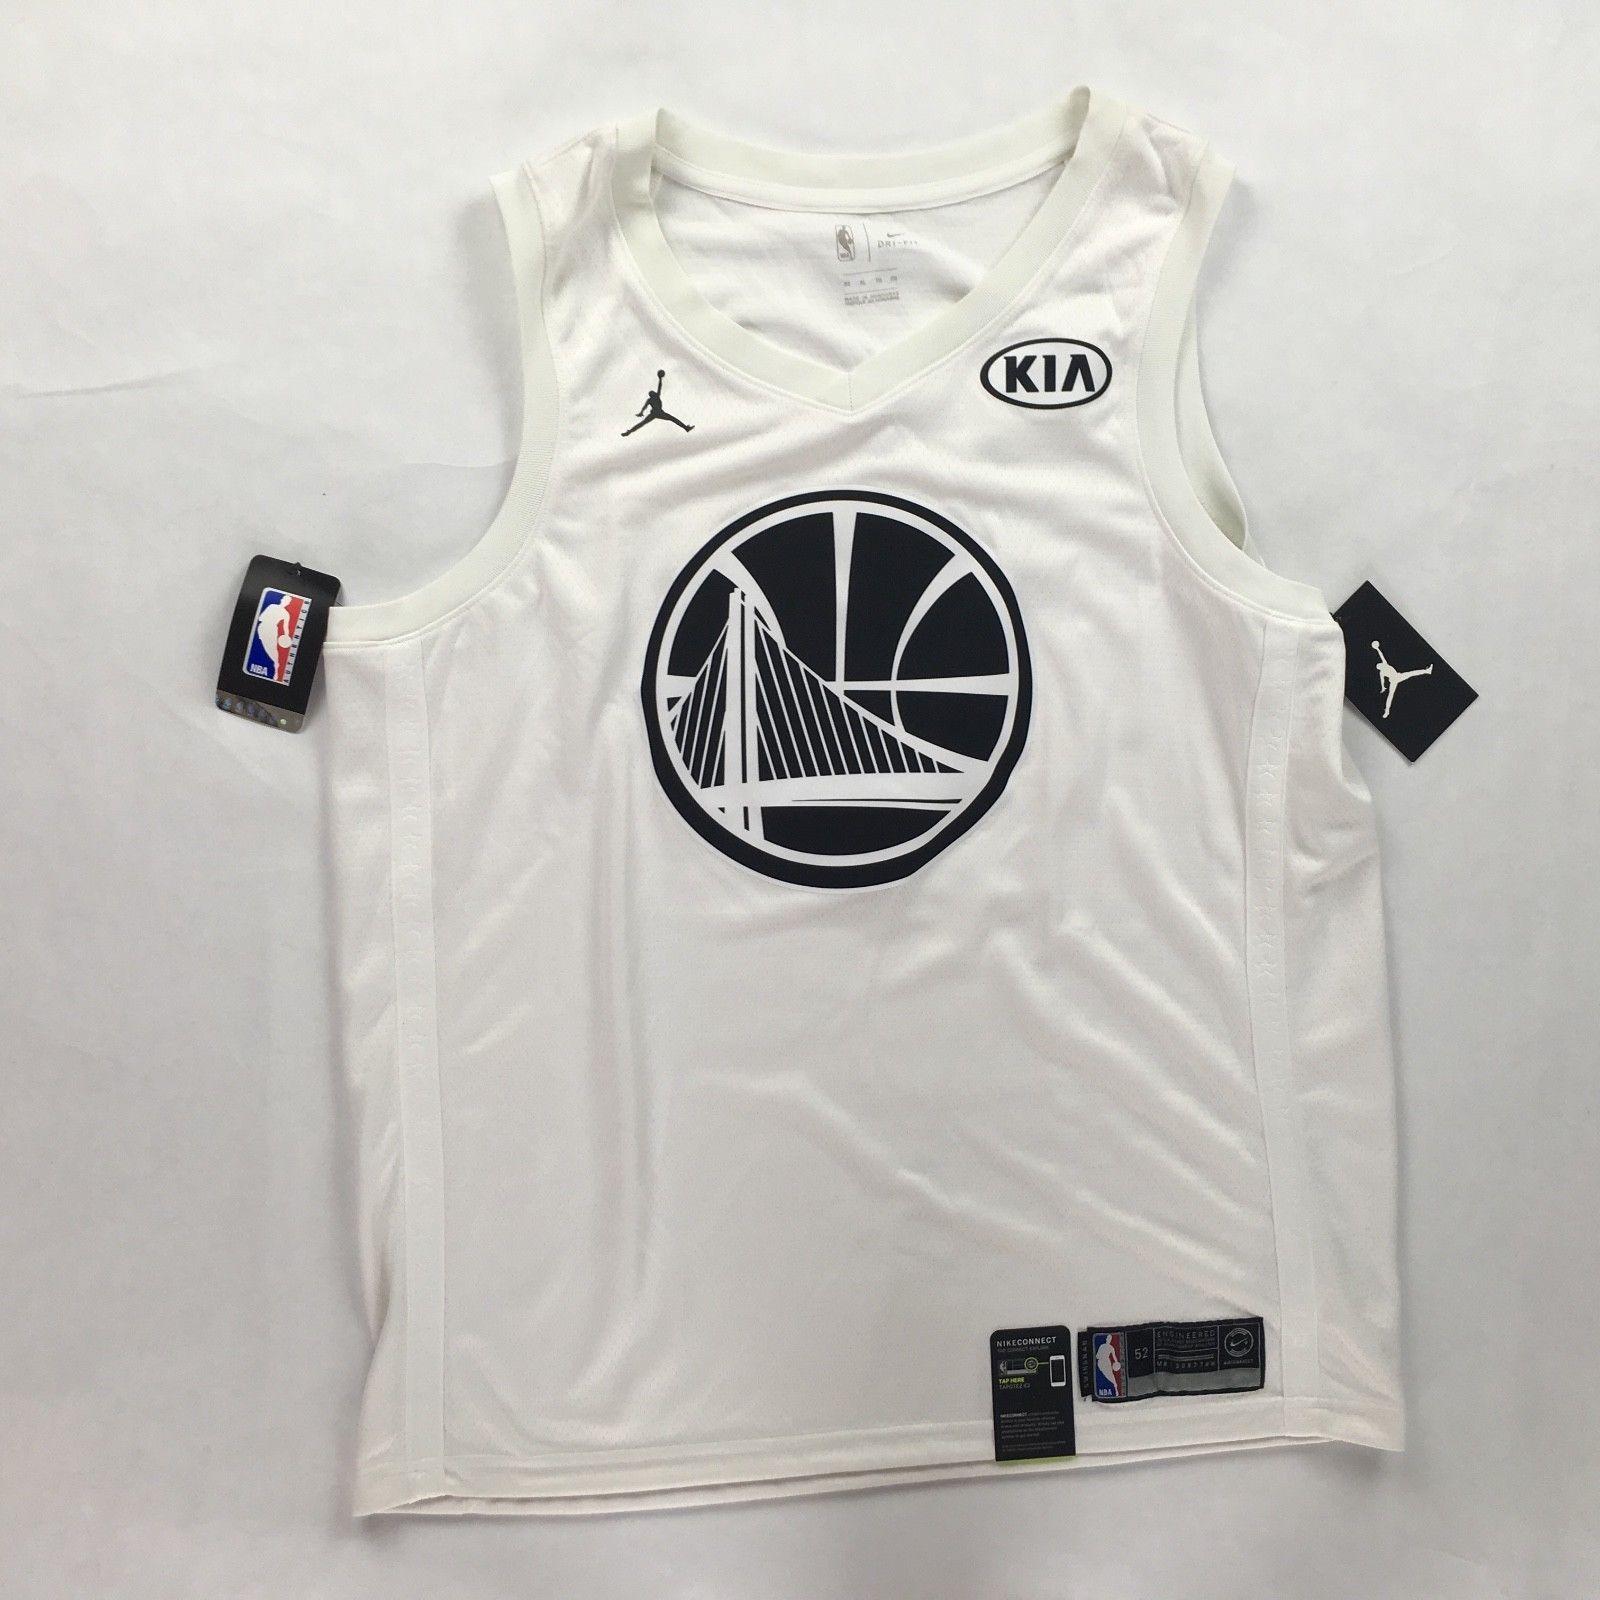 0a1b73bf Nike 2018 NBA All Star Stephen Curry Warriors Swingman White Jersey Mens  XL-XXL - Curry Jerseys - Trending and latest Curry Jerseys #curryjerseys ...